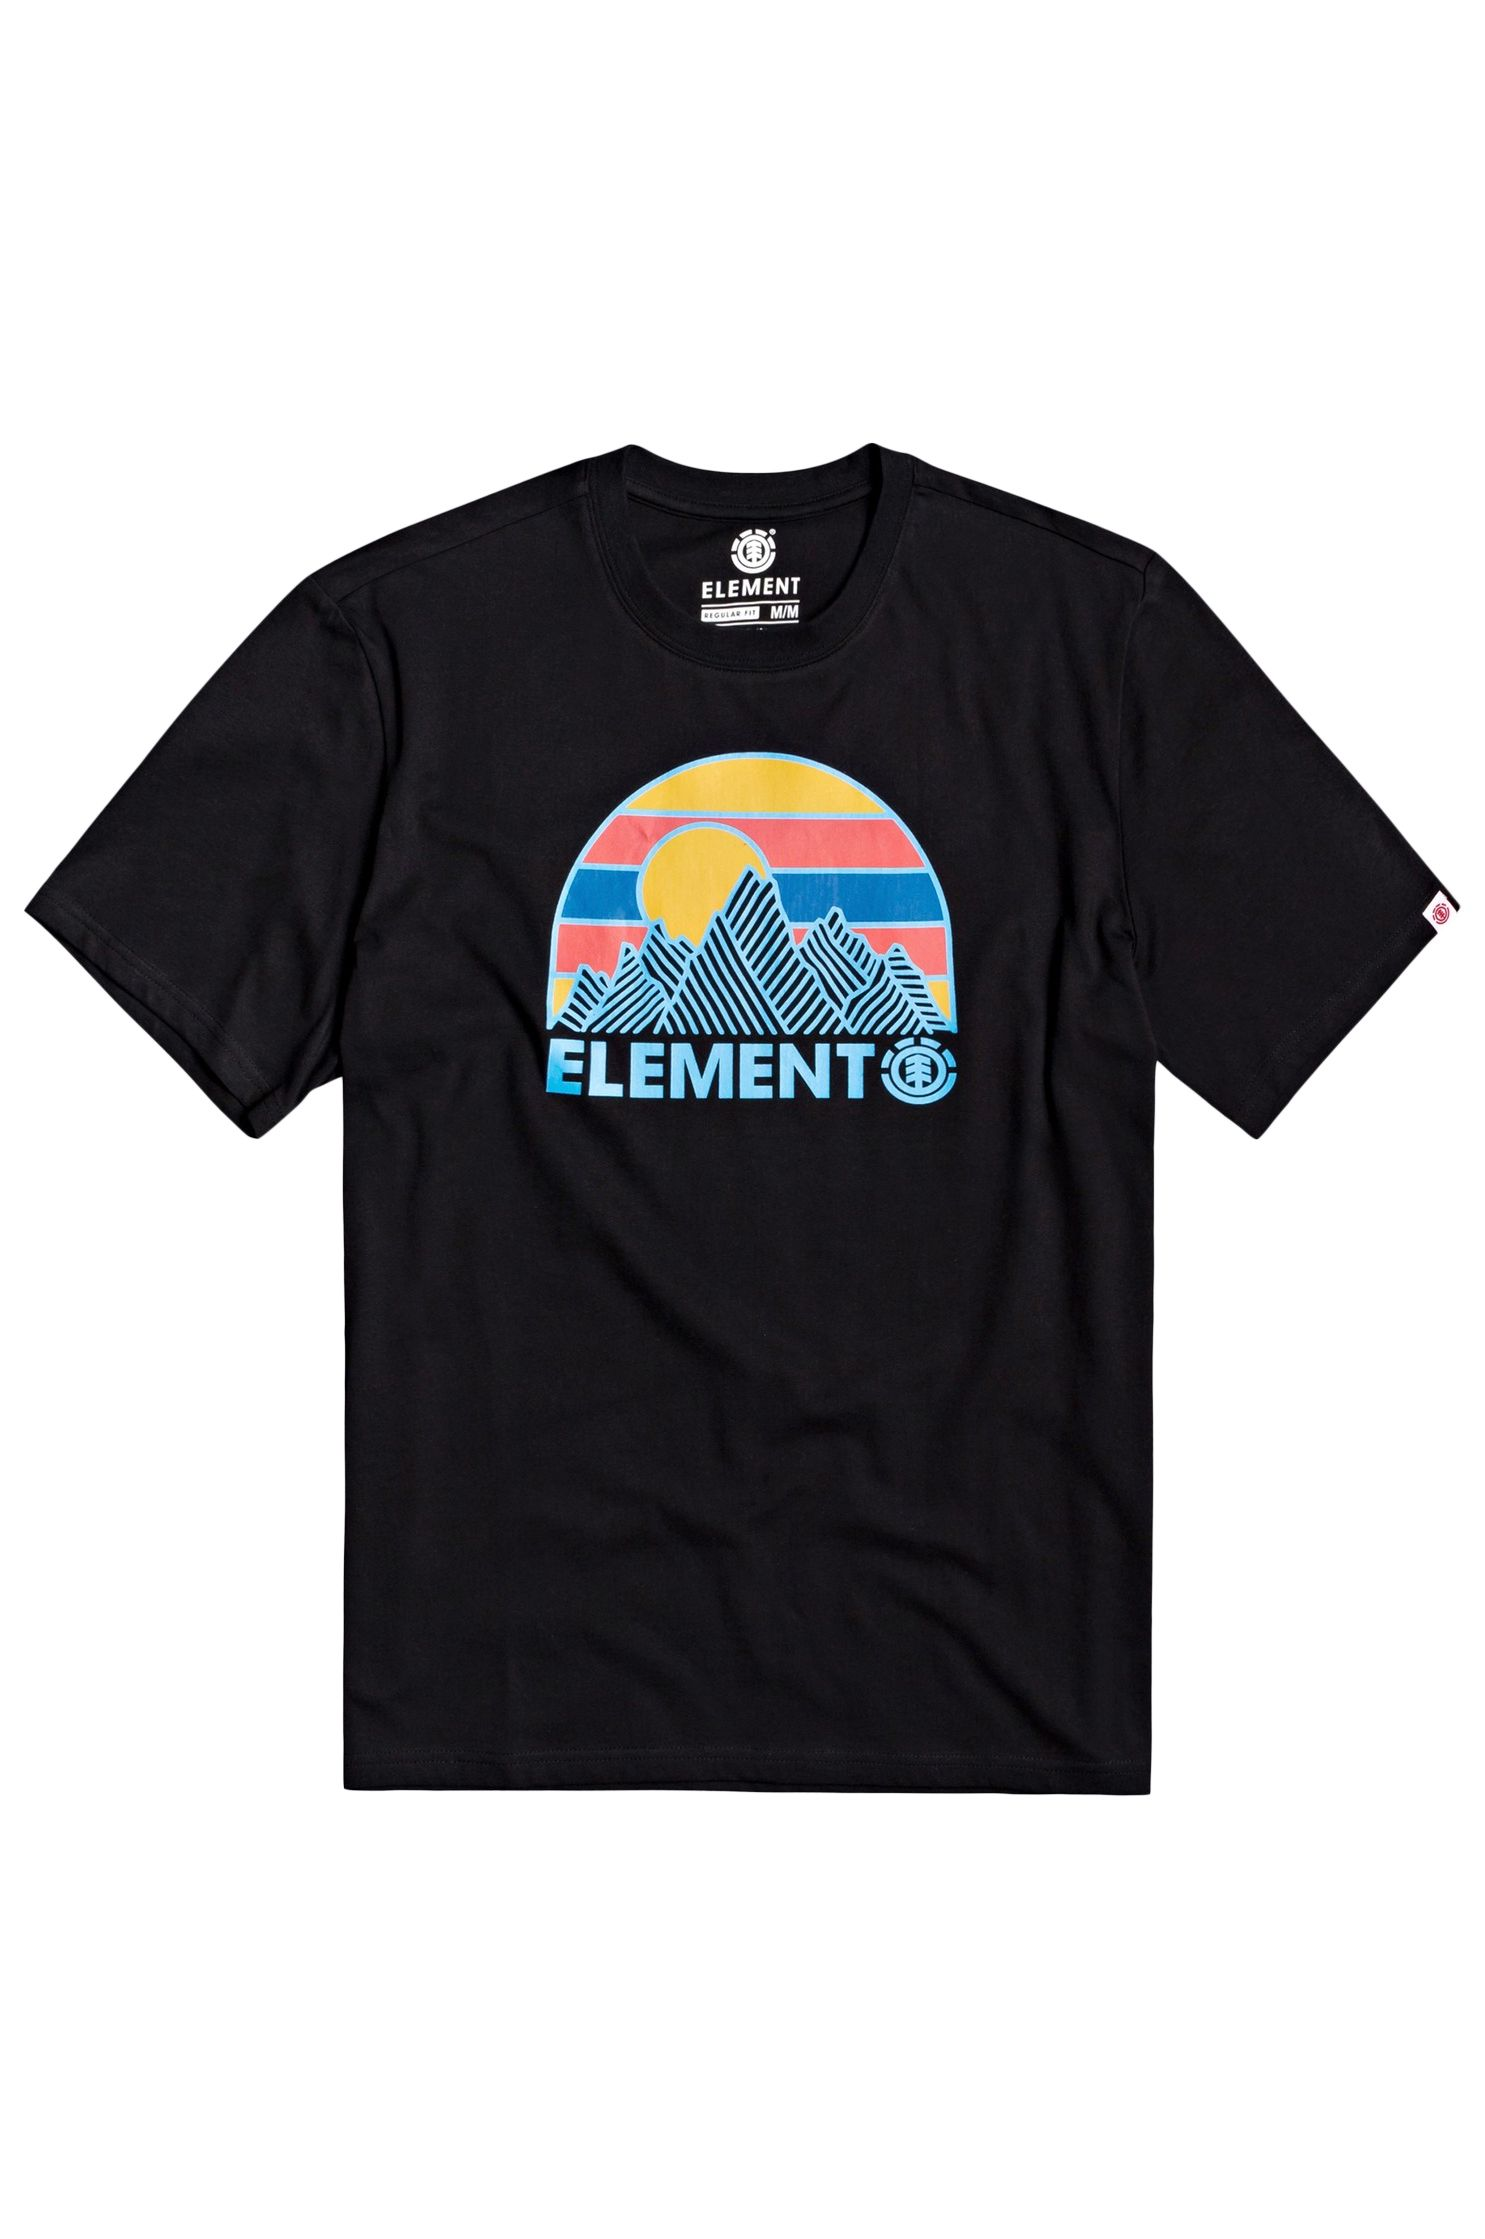 T-Shirt Element KOZY SPORTING GOOD PROGR. Flint Black